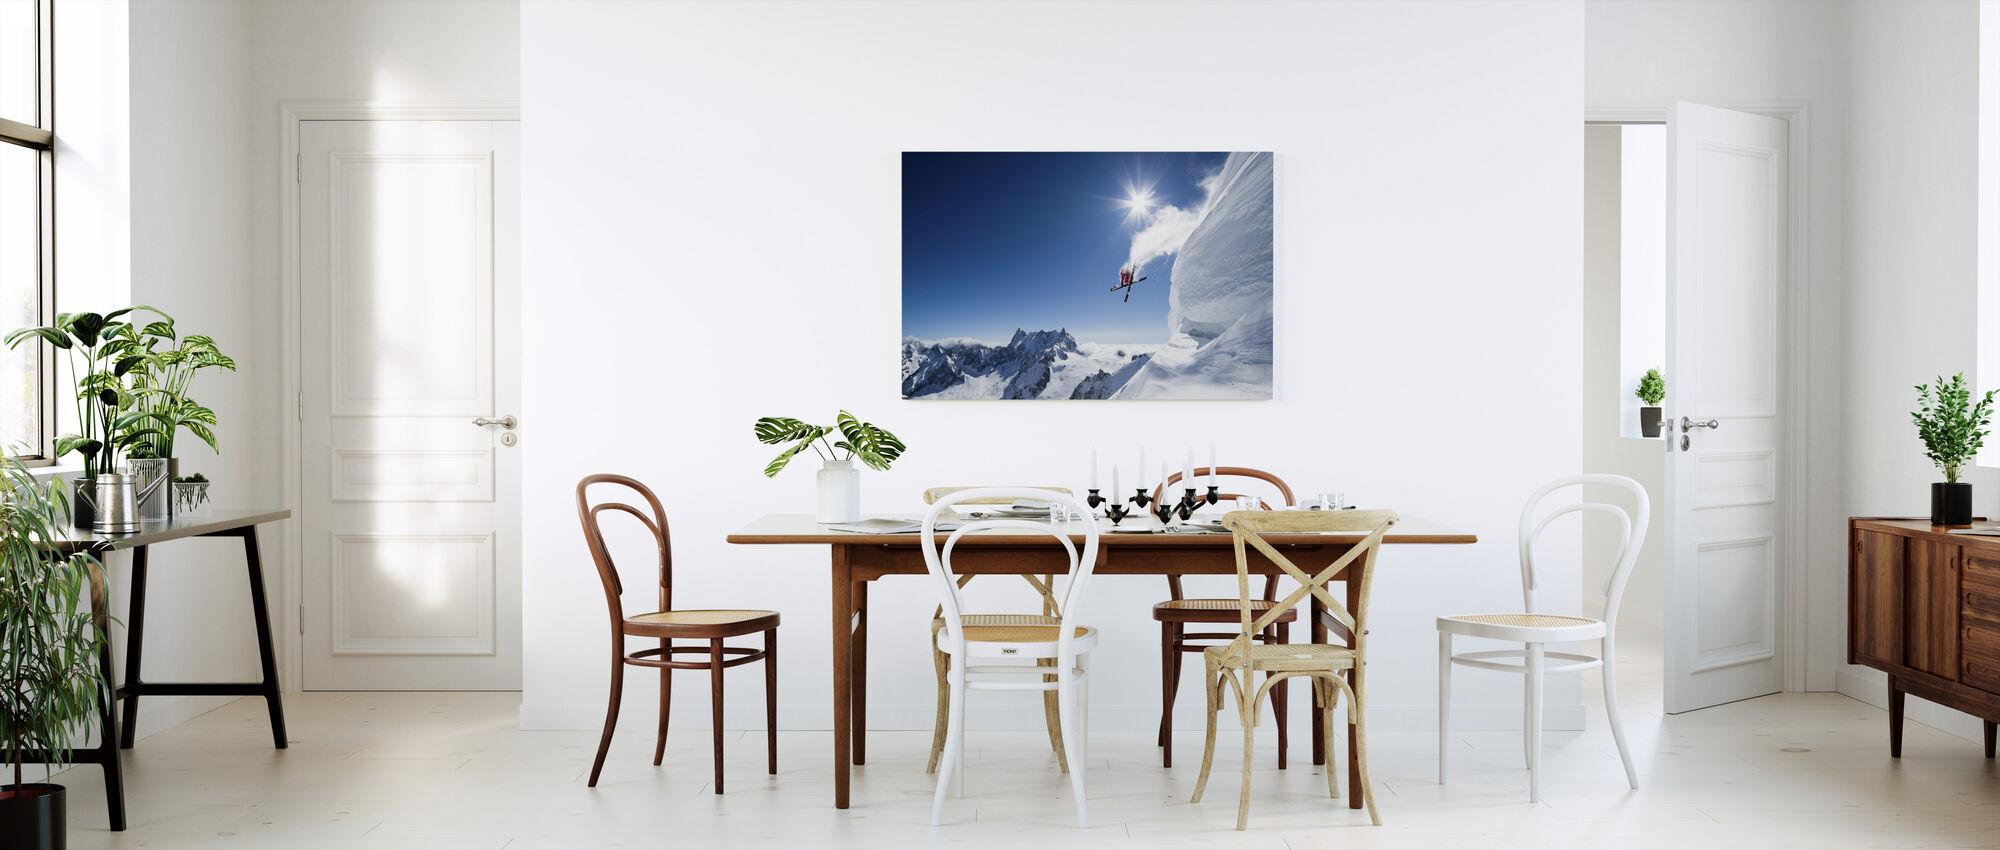 Extreme Skiing - Canvas print - Kitchen